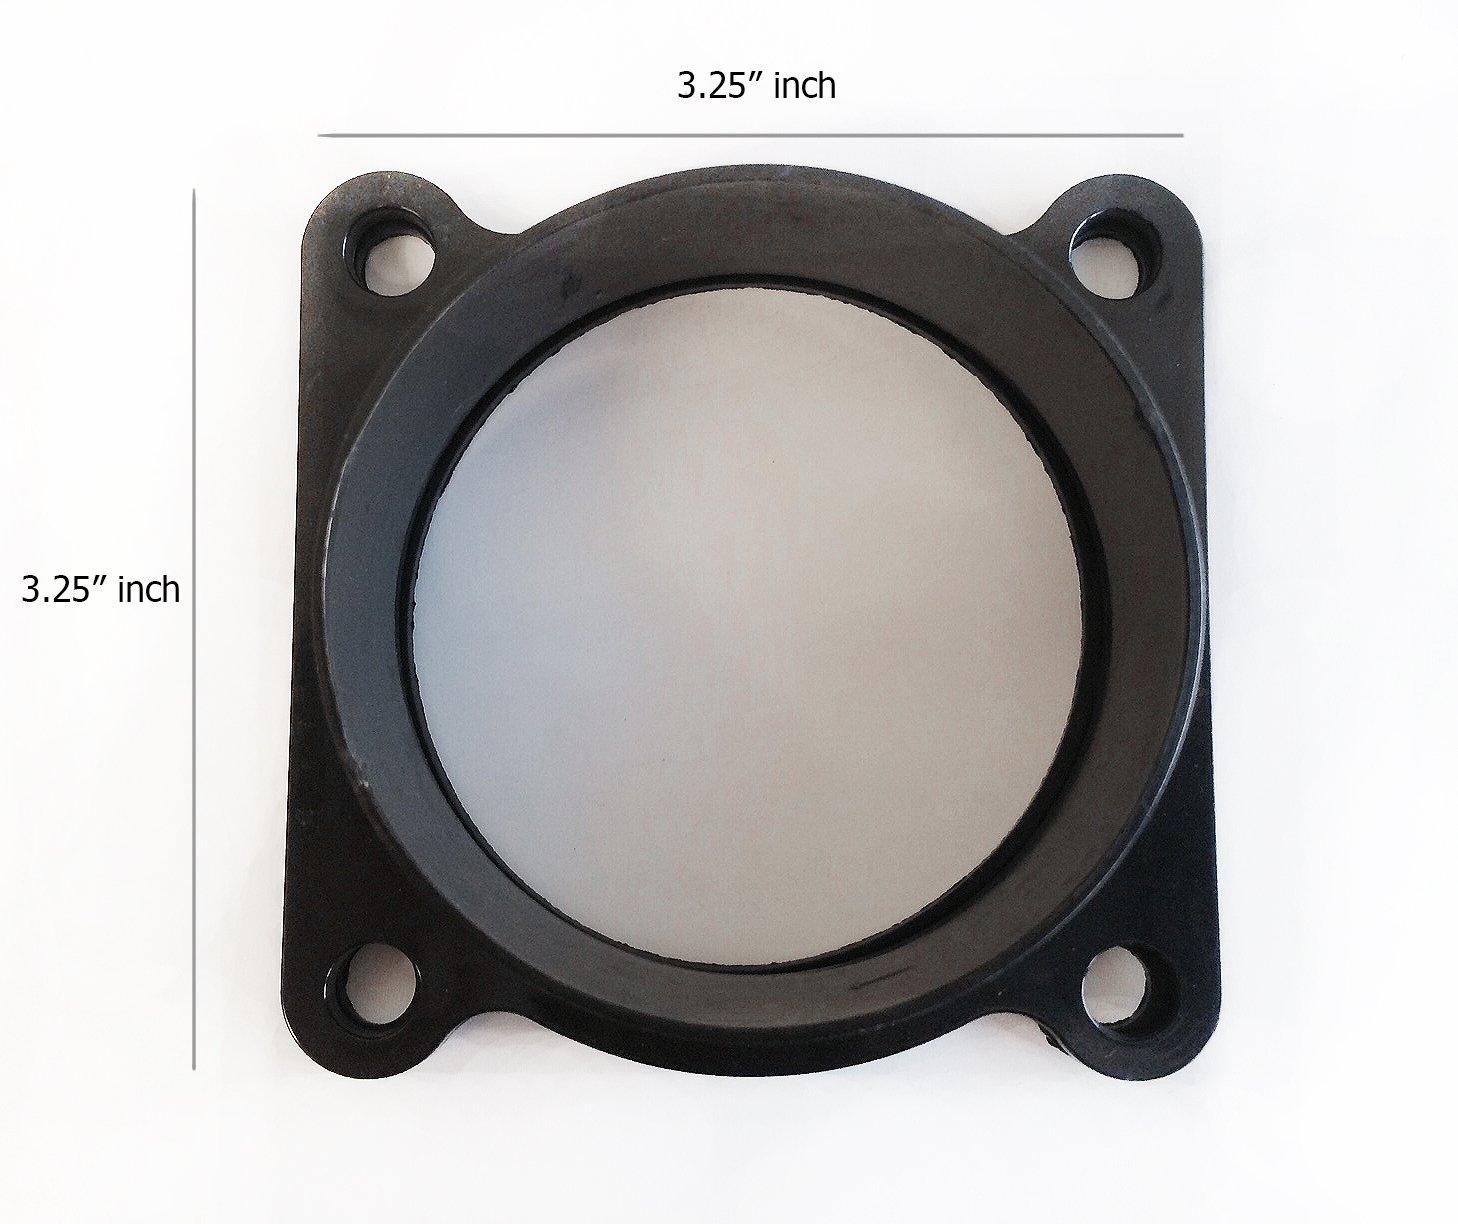 2003-2006 Infiniti G35 3.5L V6 Air Intake MAF Sensor Adapter Plate